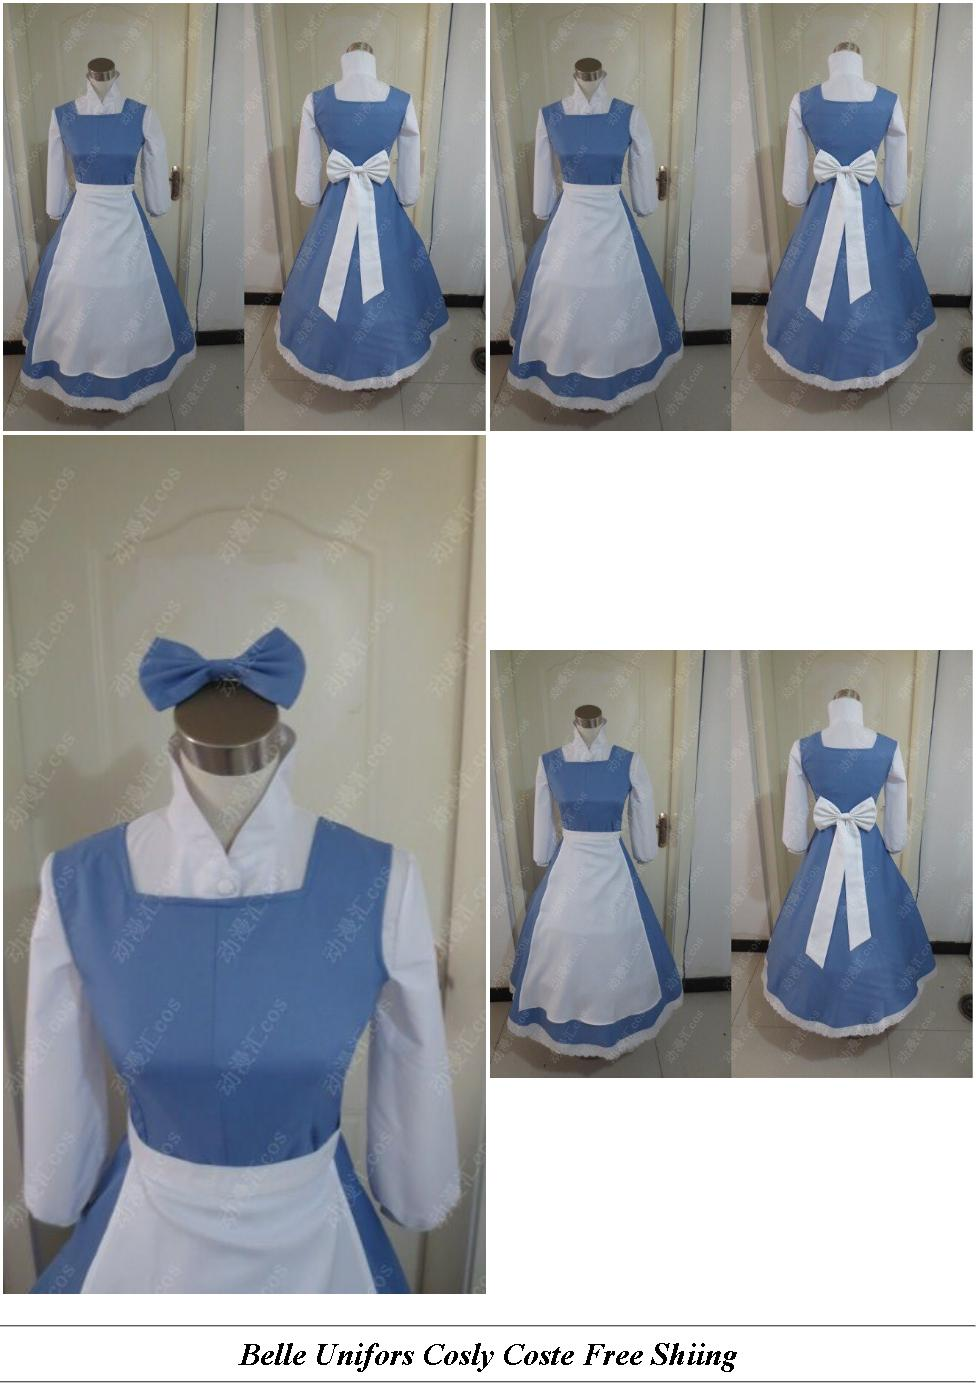 White Tunic Dress Amazon - Vintage Thrift Stores Near Me - Lace Cocktail Dress Pinterest